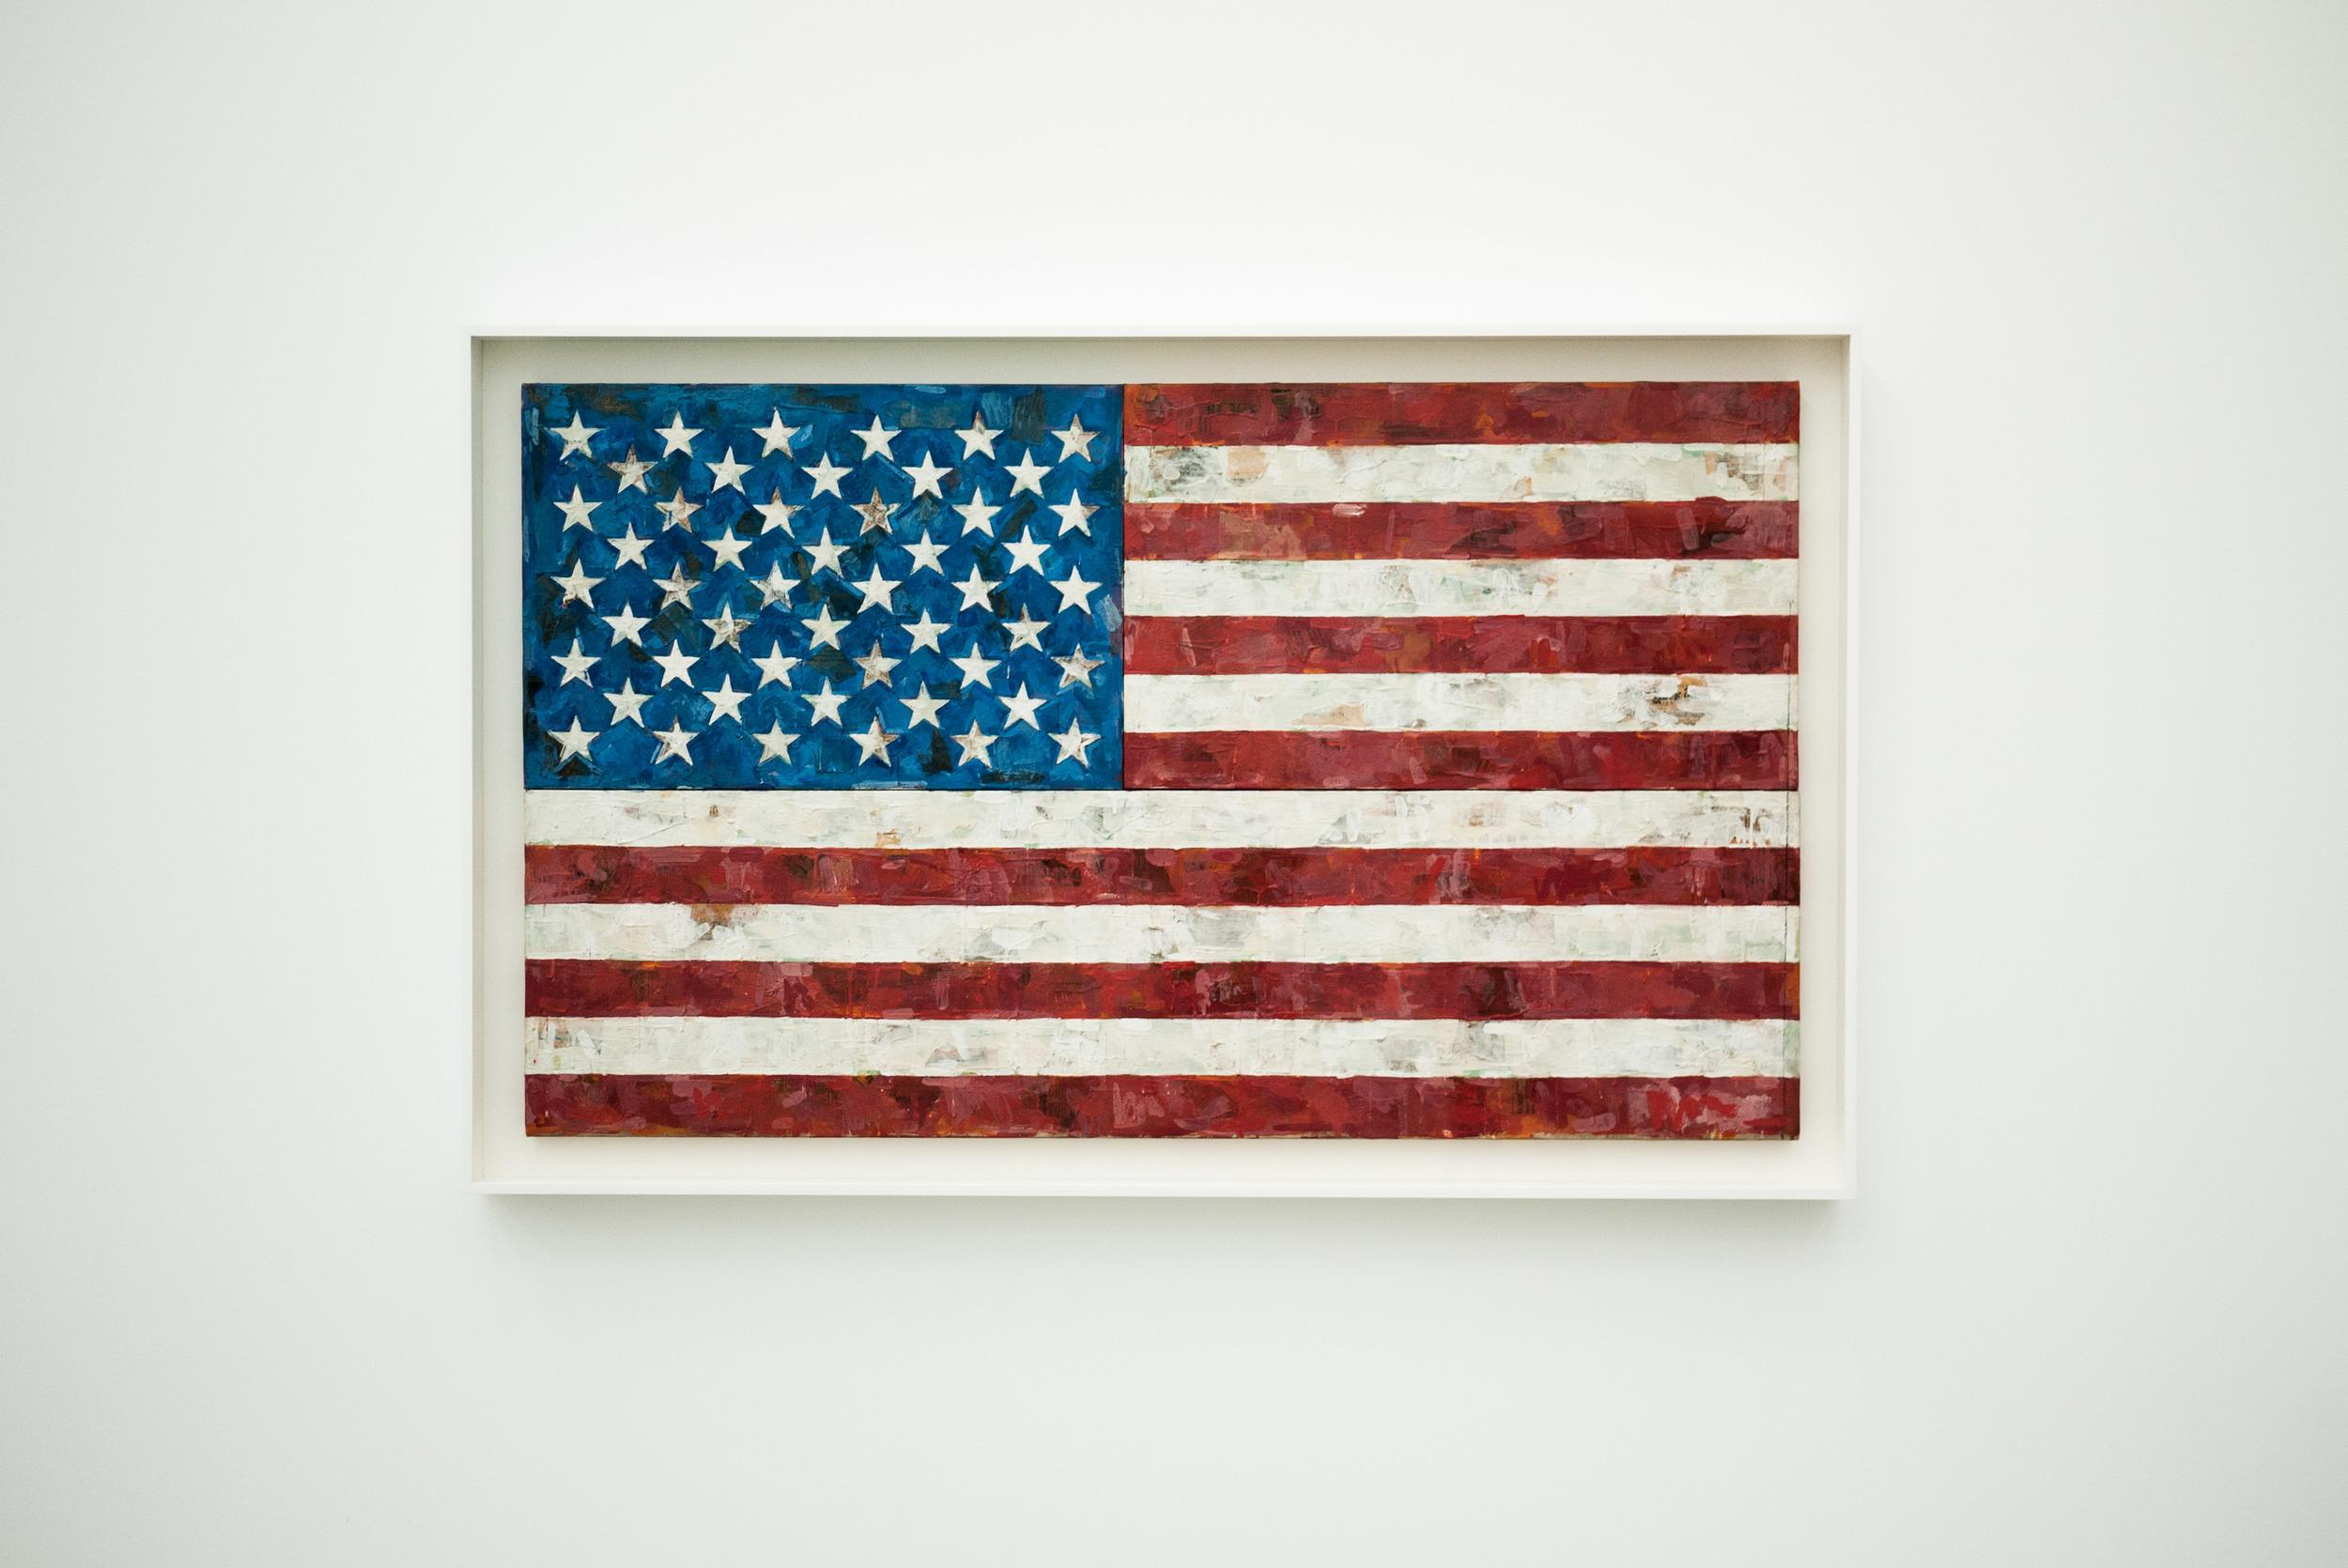 Jasper Johns - American Flag